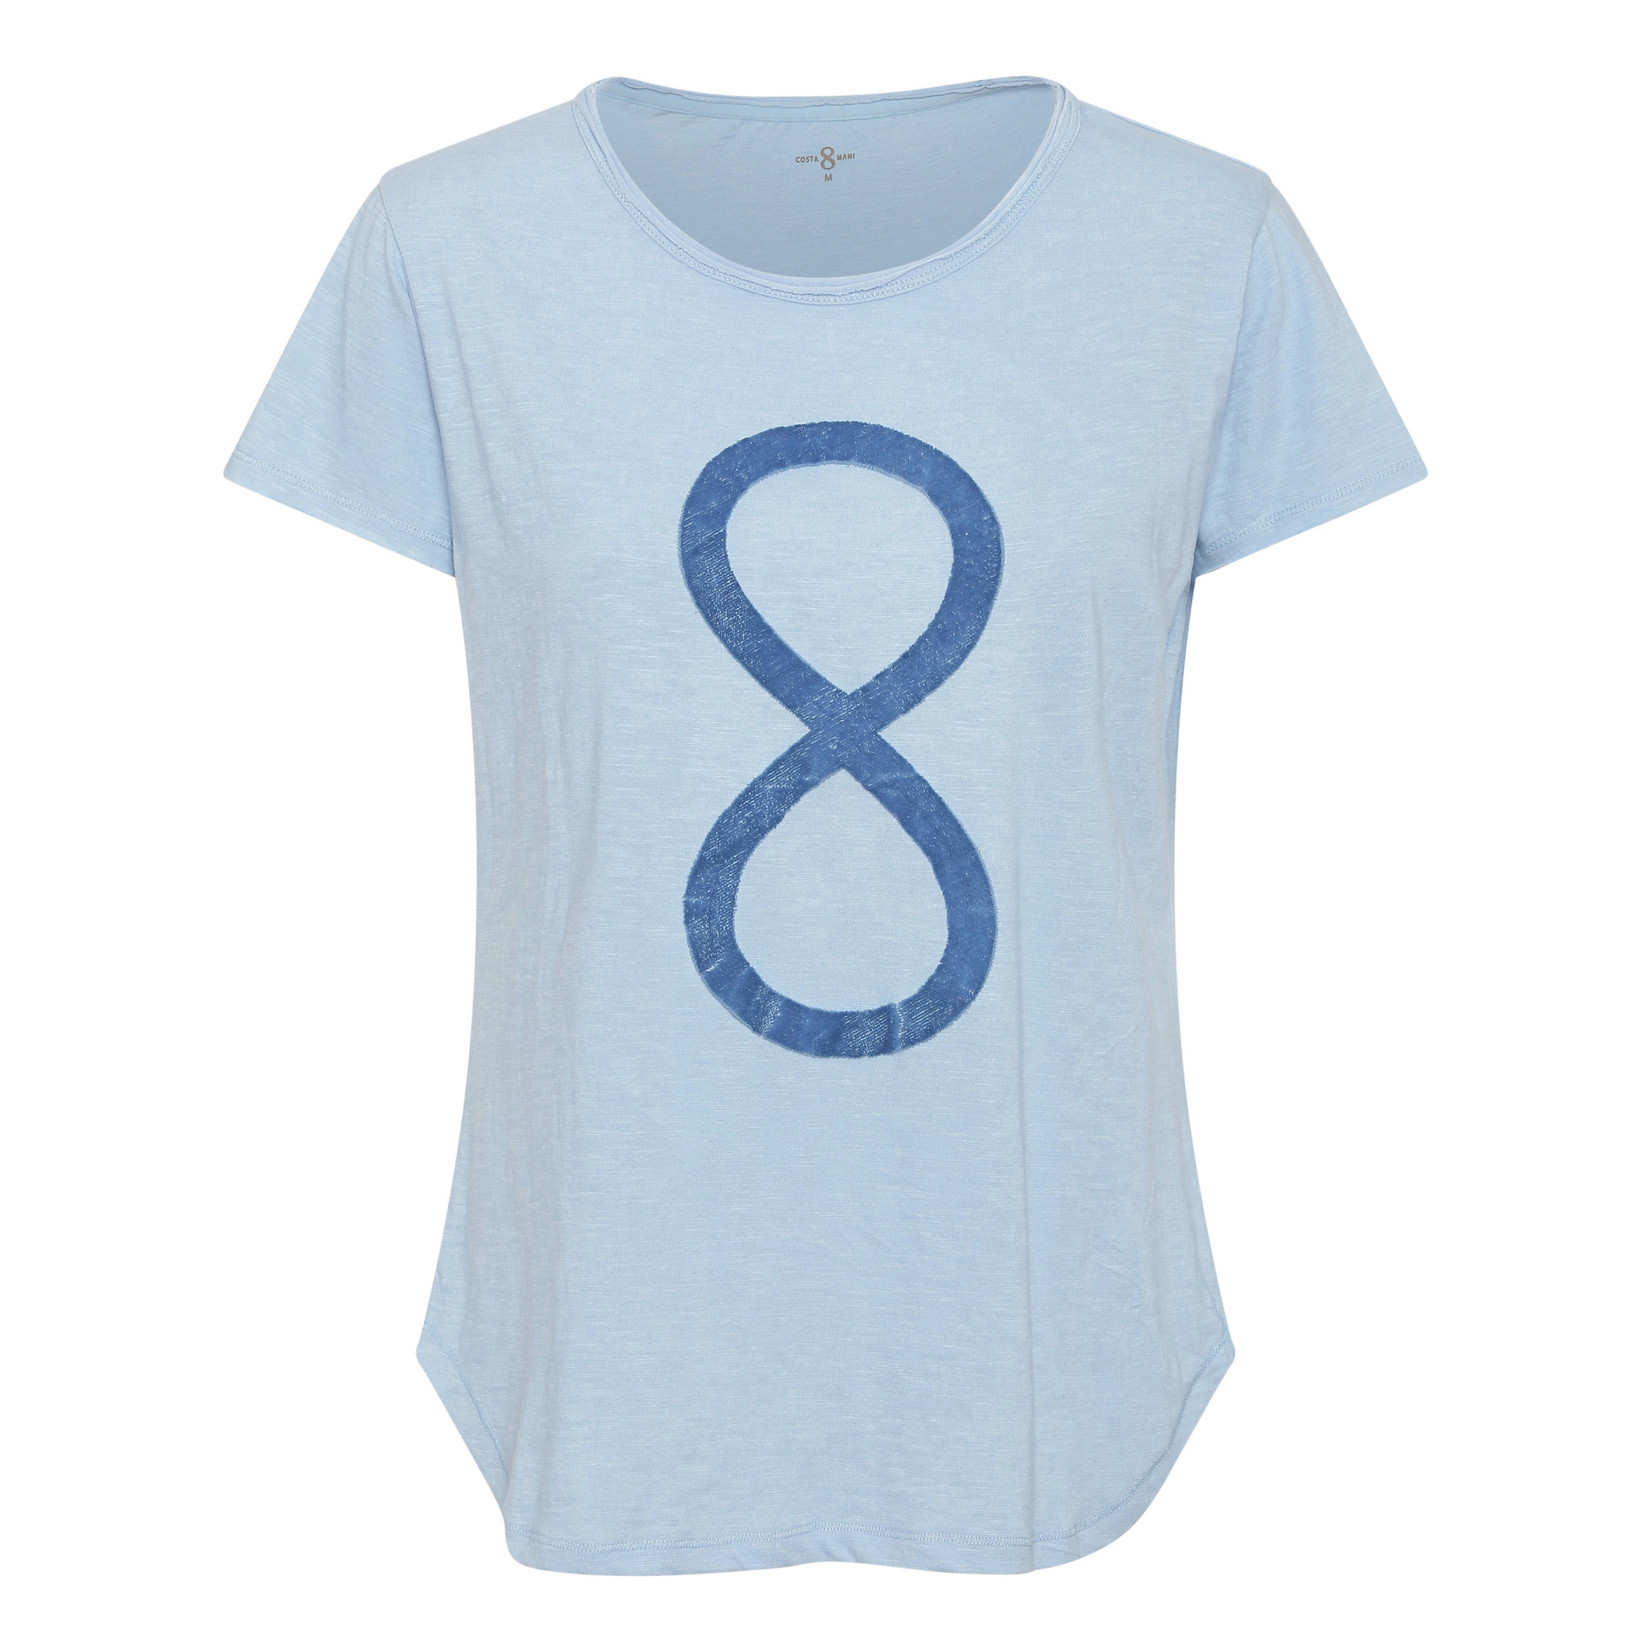 Costa & Mani Costa Mani infinity shirt bleu 2101550